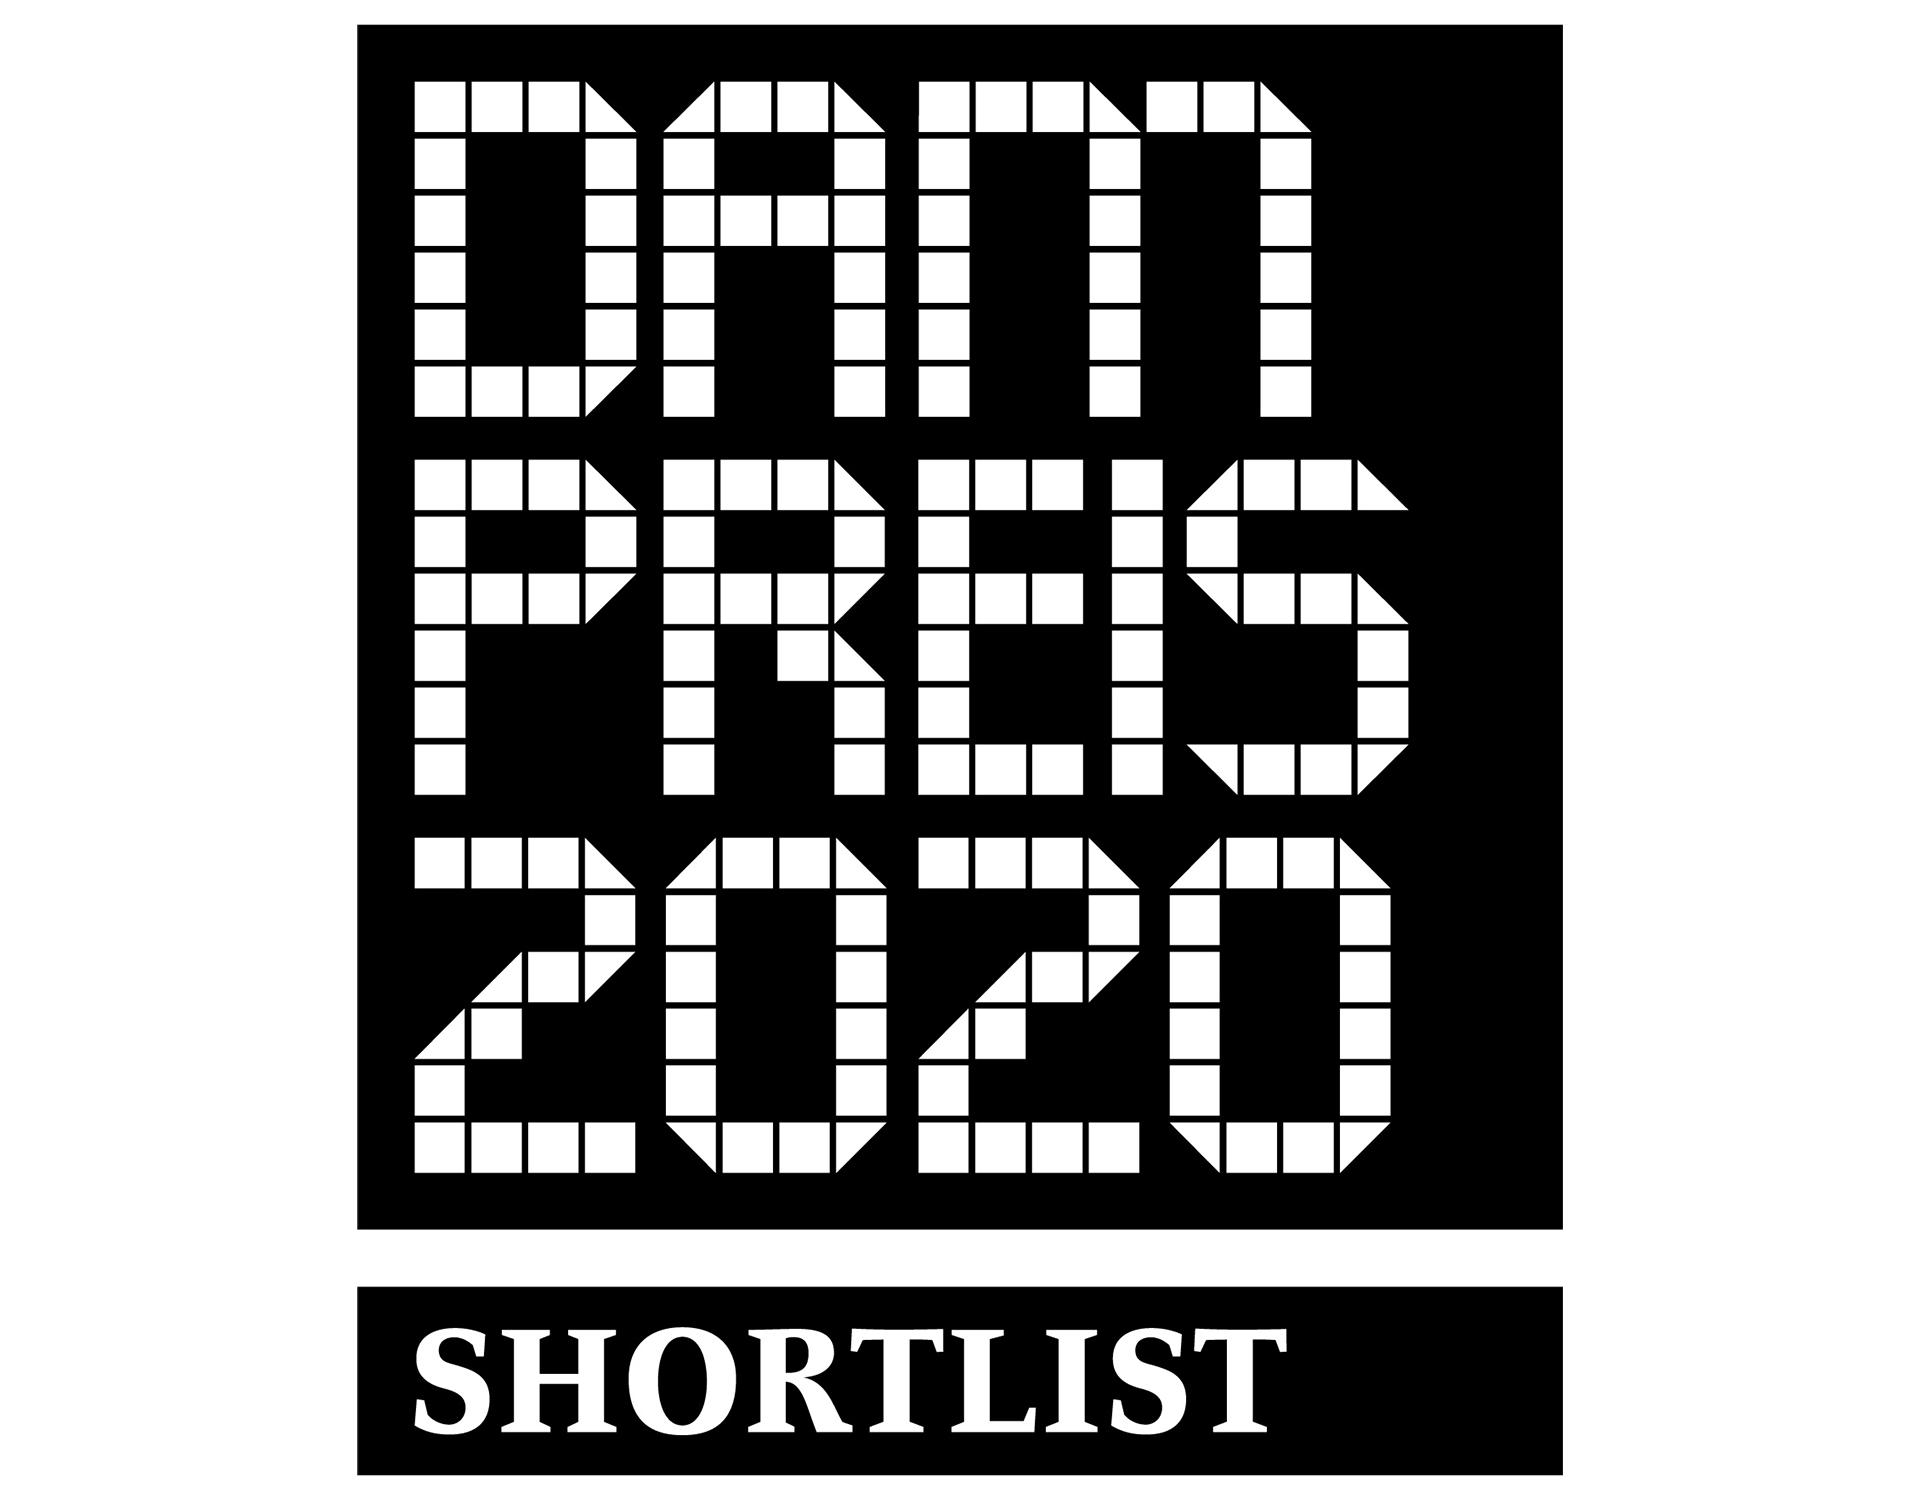 DAM Preis Shortlist Klopstockhoefe limbrock tubbesing architekten